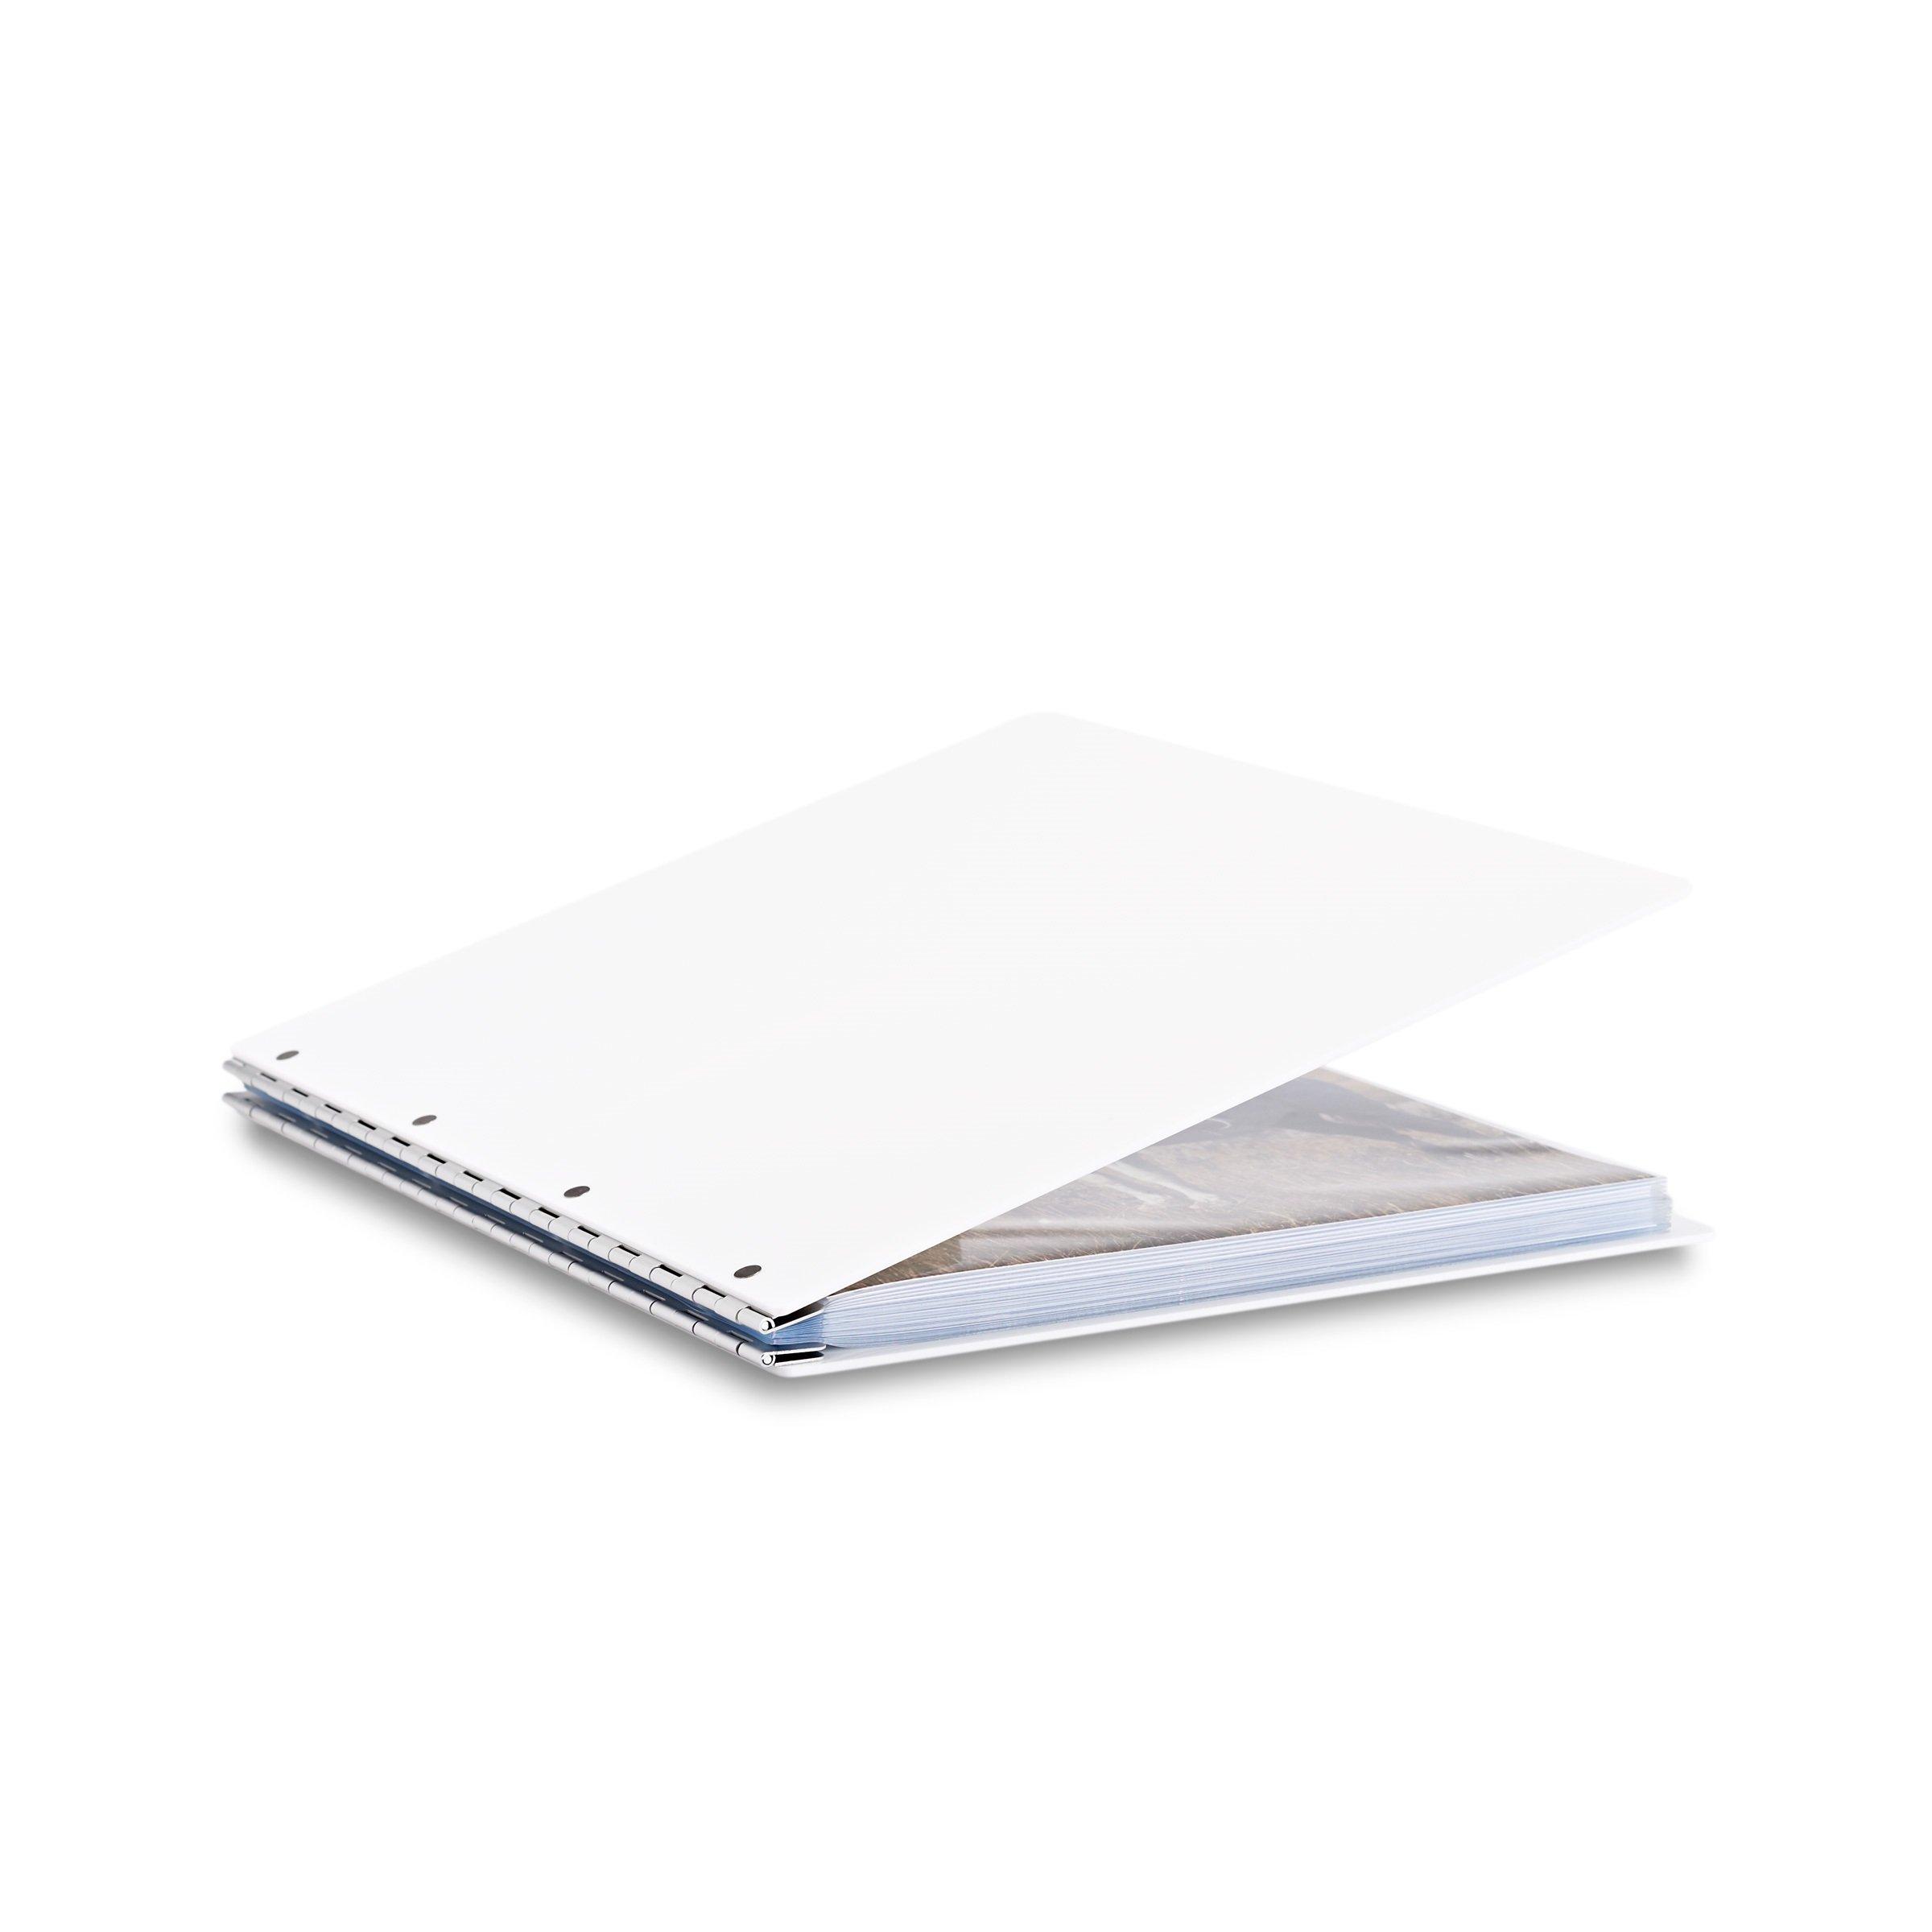 Pina Zangaro Vista 11x14 Portriat Screwpost Binder Snow, Includes 20 Pro-Archive Sheet Protectors (34071)